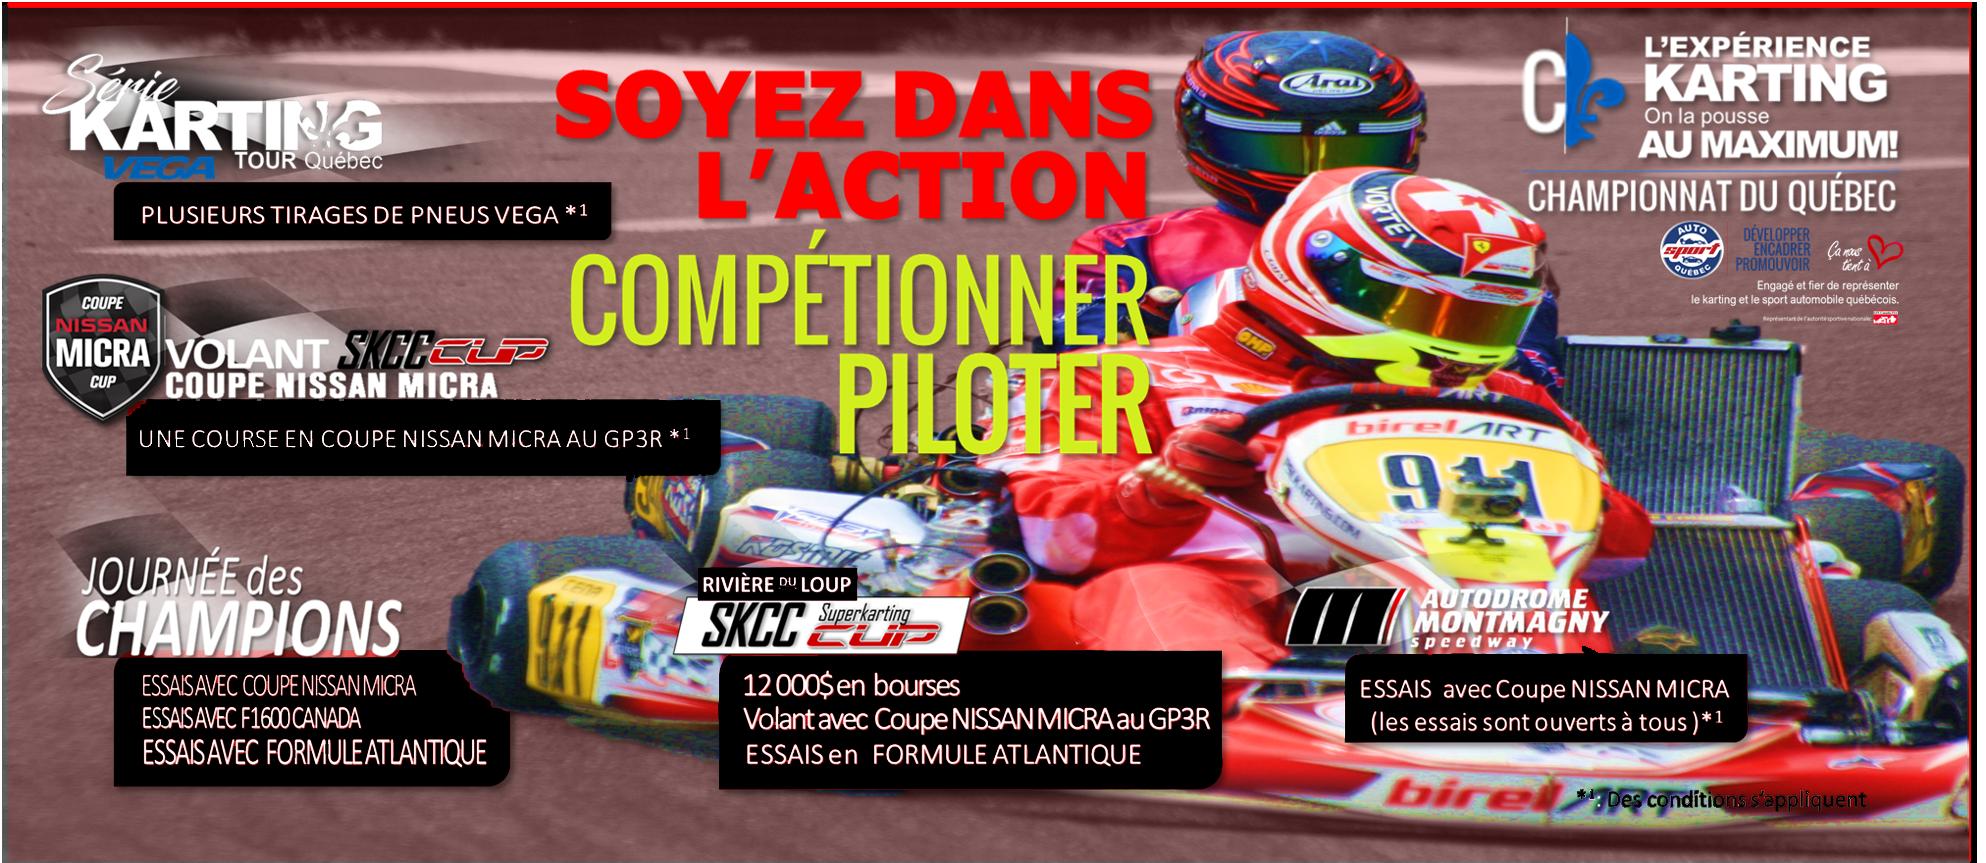 Saison de karting de compétition 2019